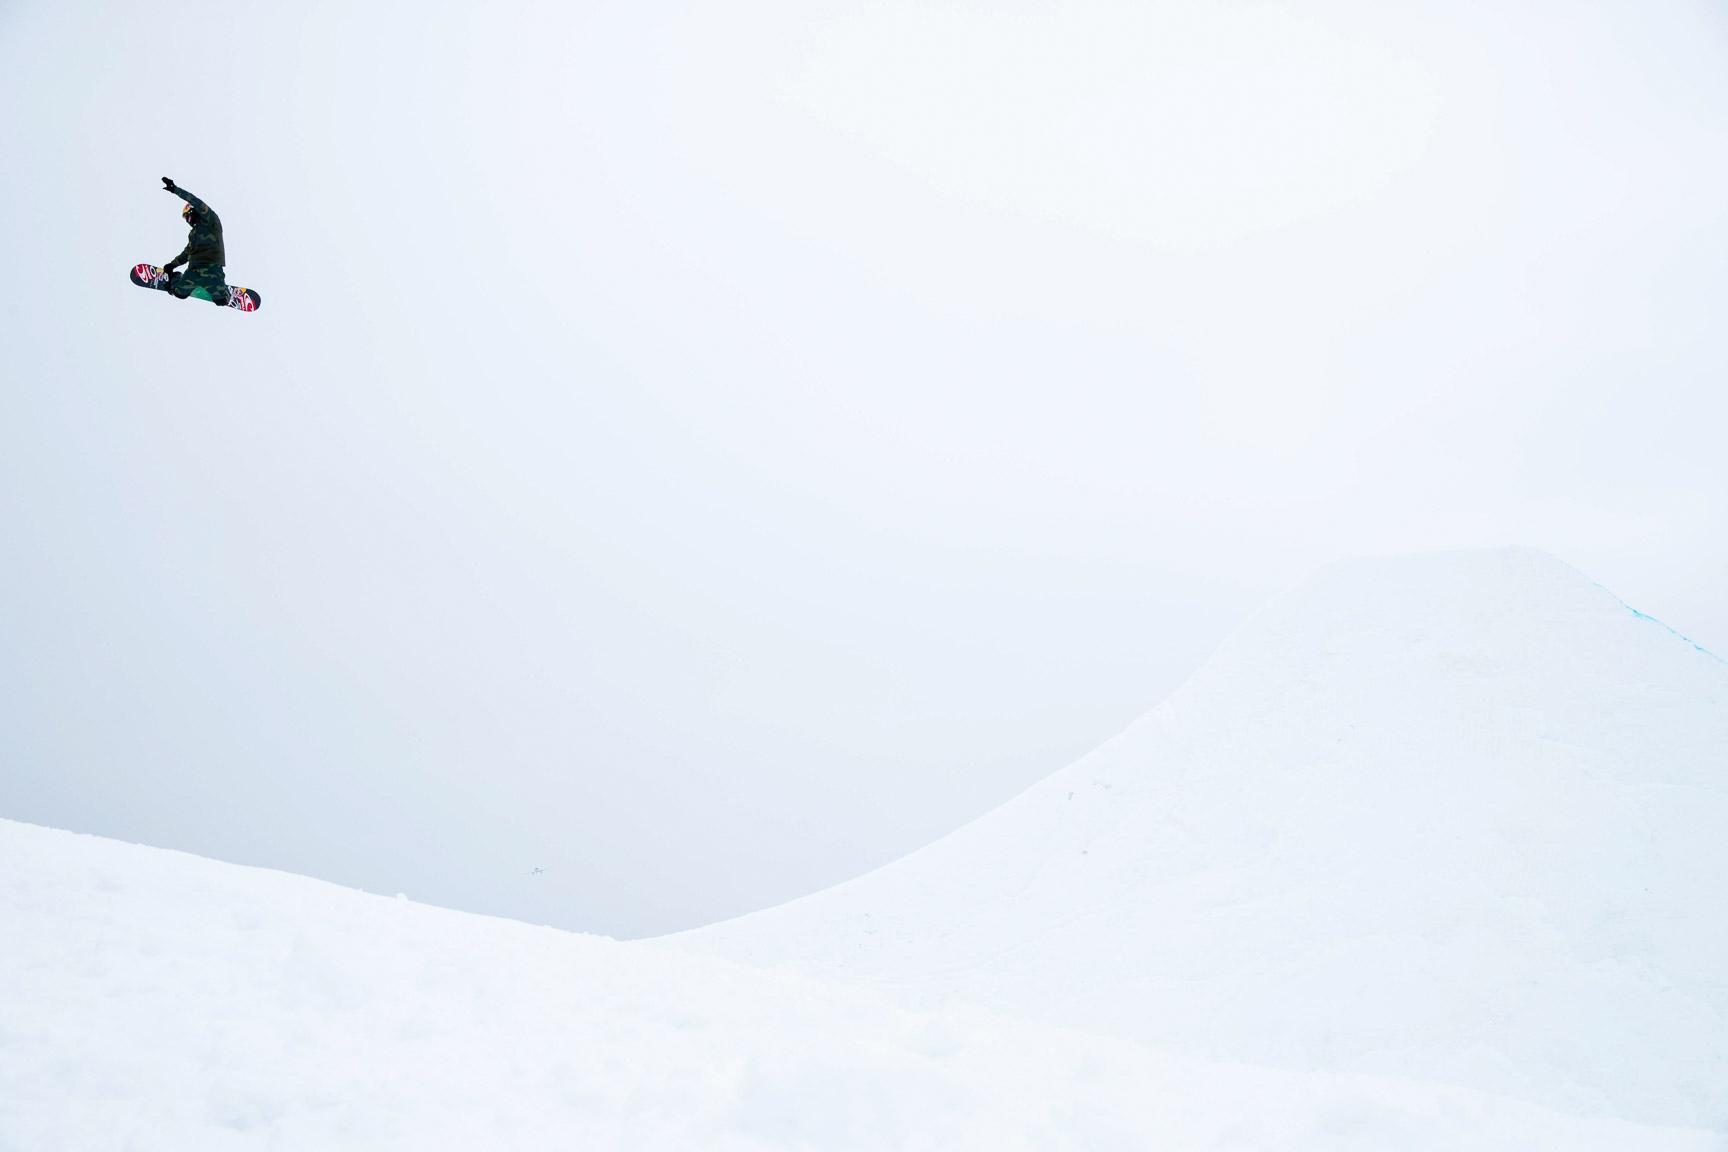 Sebastien Toutant, Snowboard Slopestyle Practice